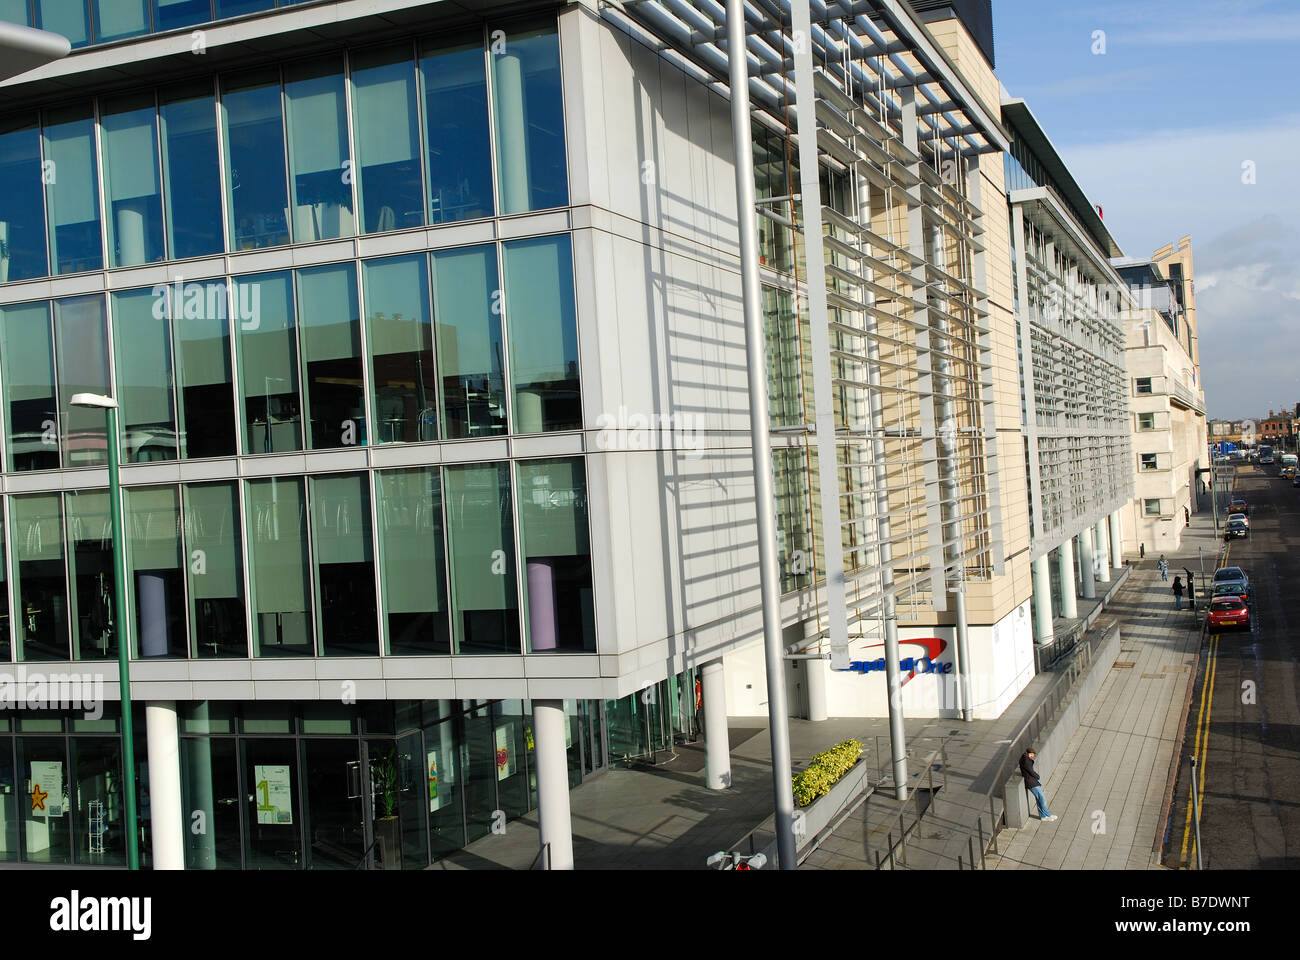 Capital One Buildings Nottingham. - Stock Image